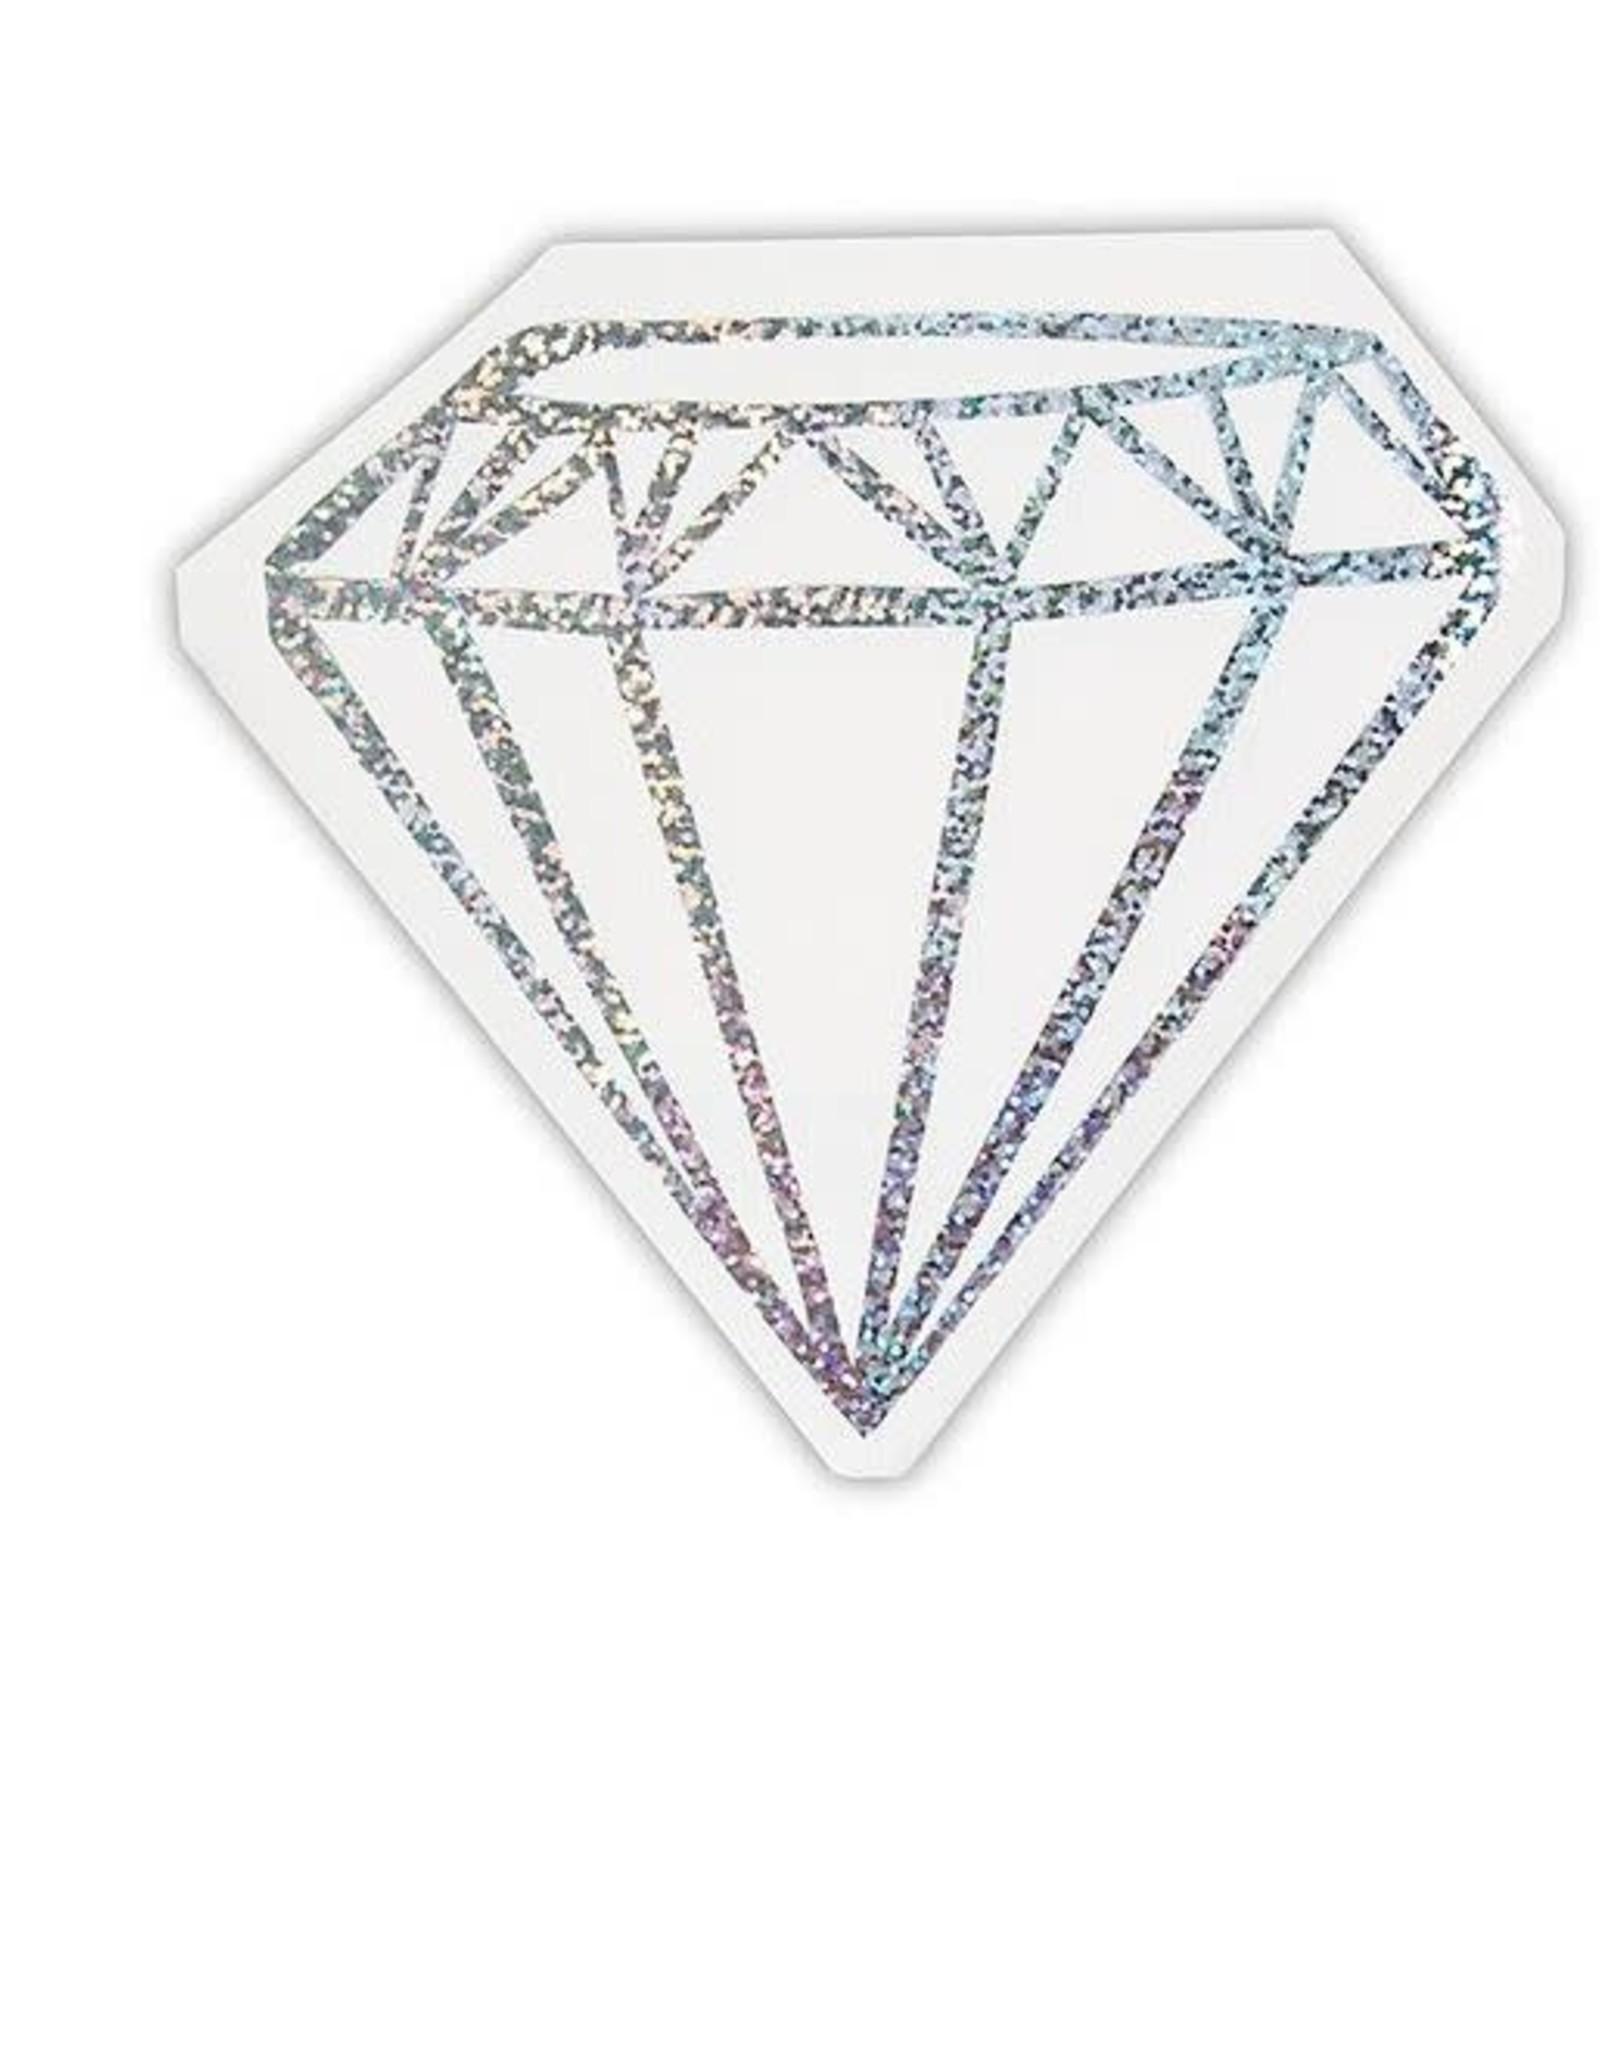 Slant Metallic Diamond Napkin 20ct